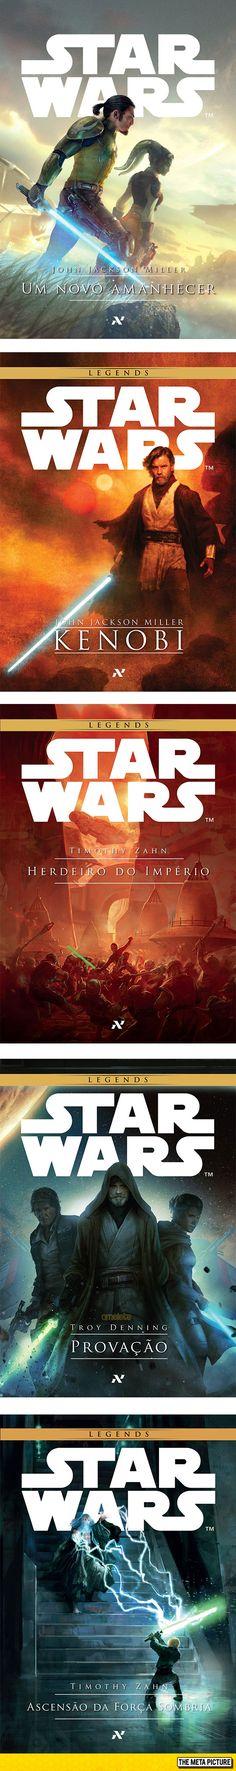 Brazilian Star Wars Books Have Astonishing Covers